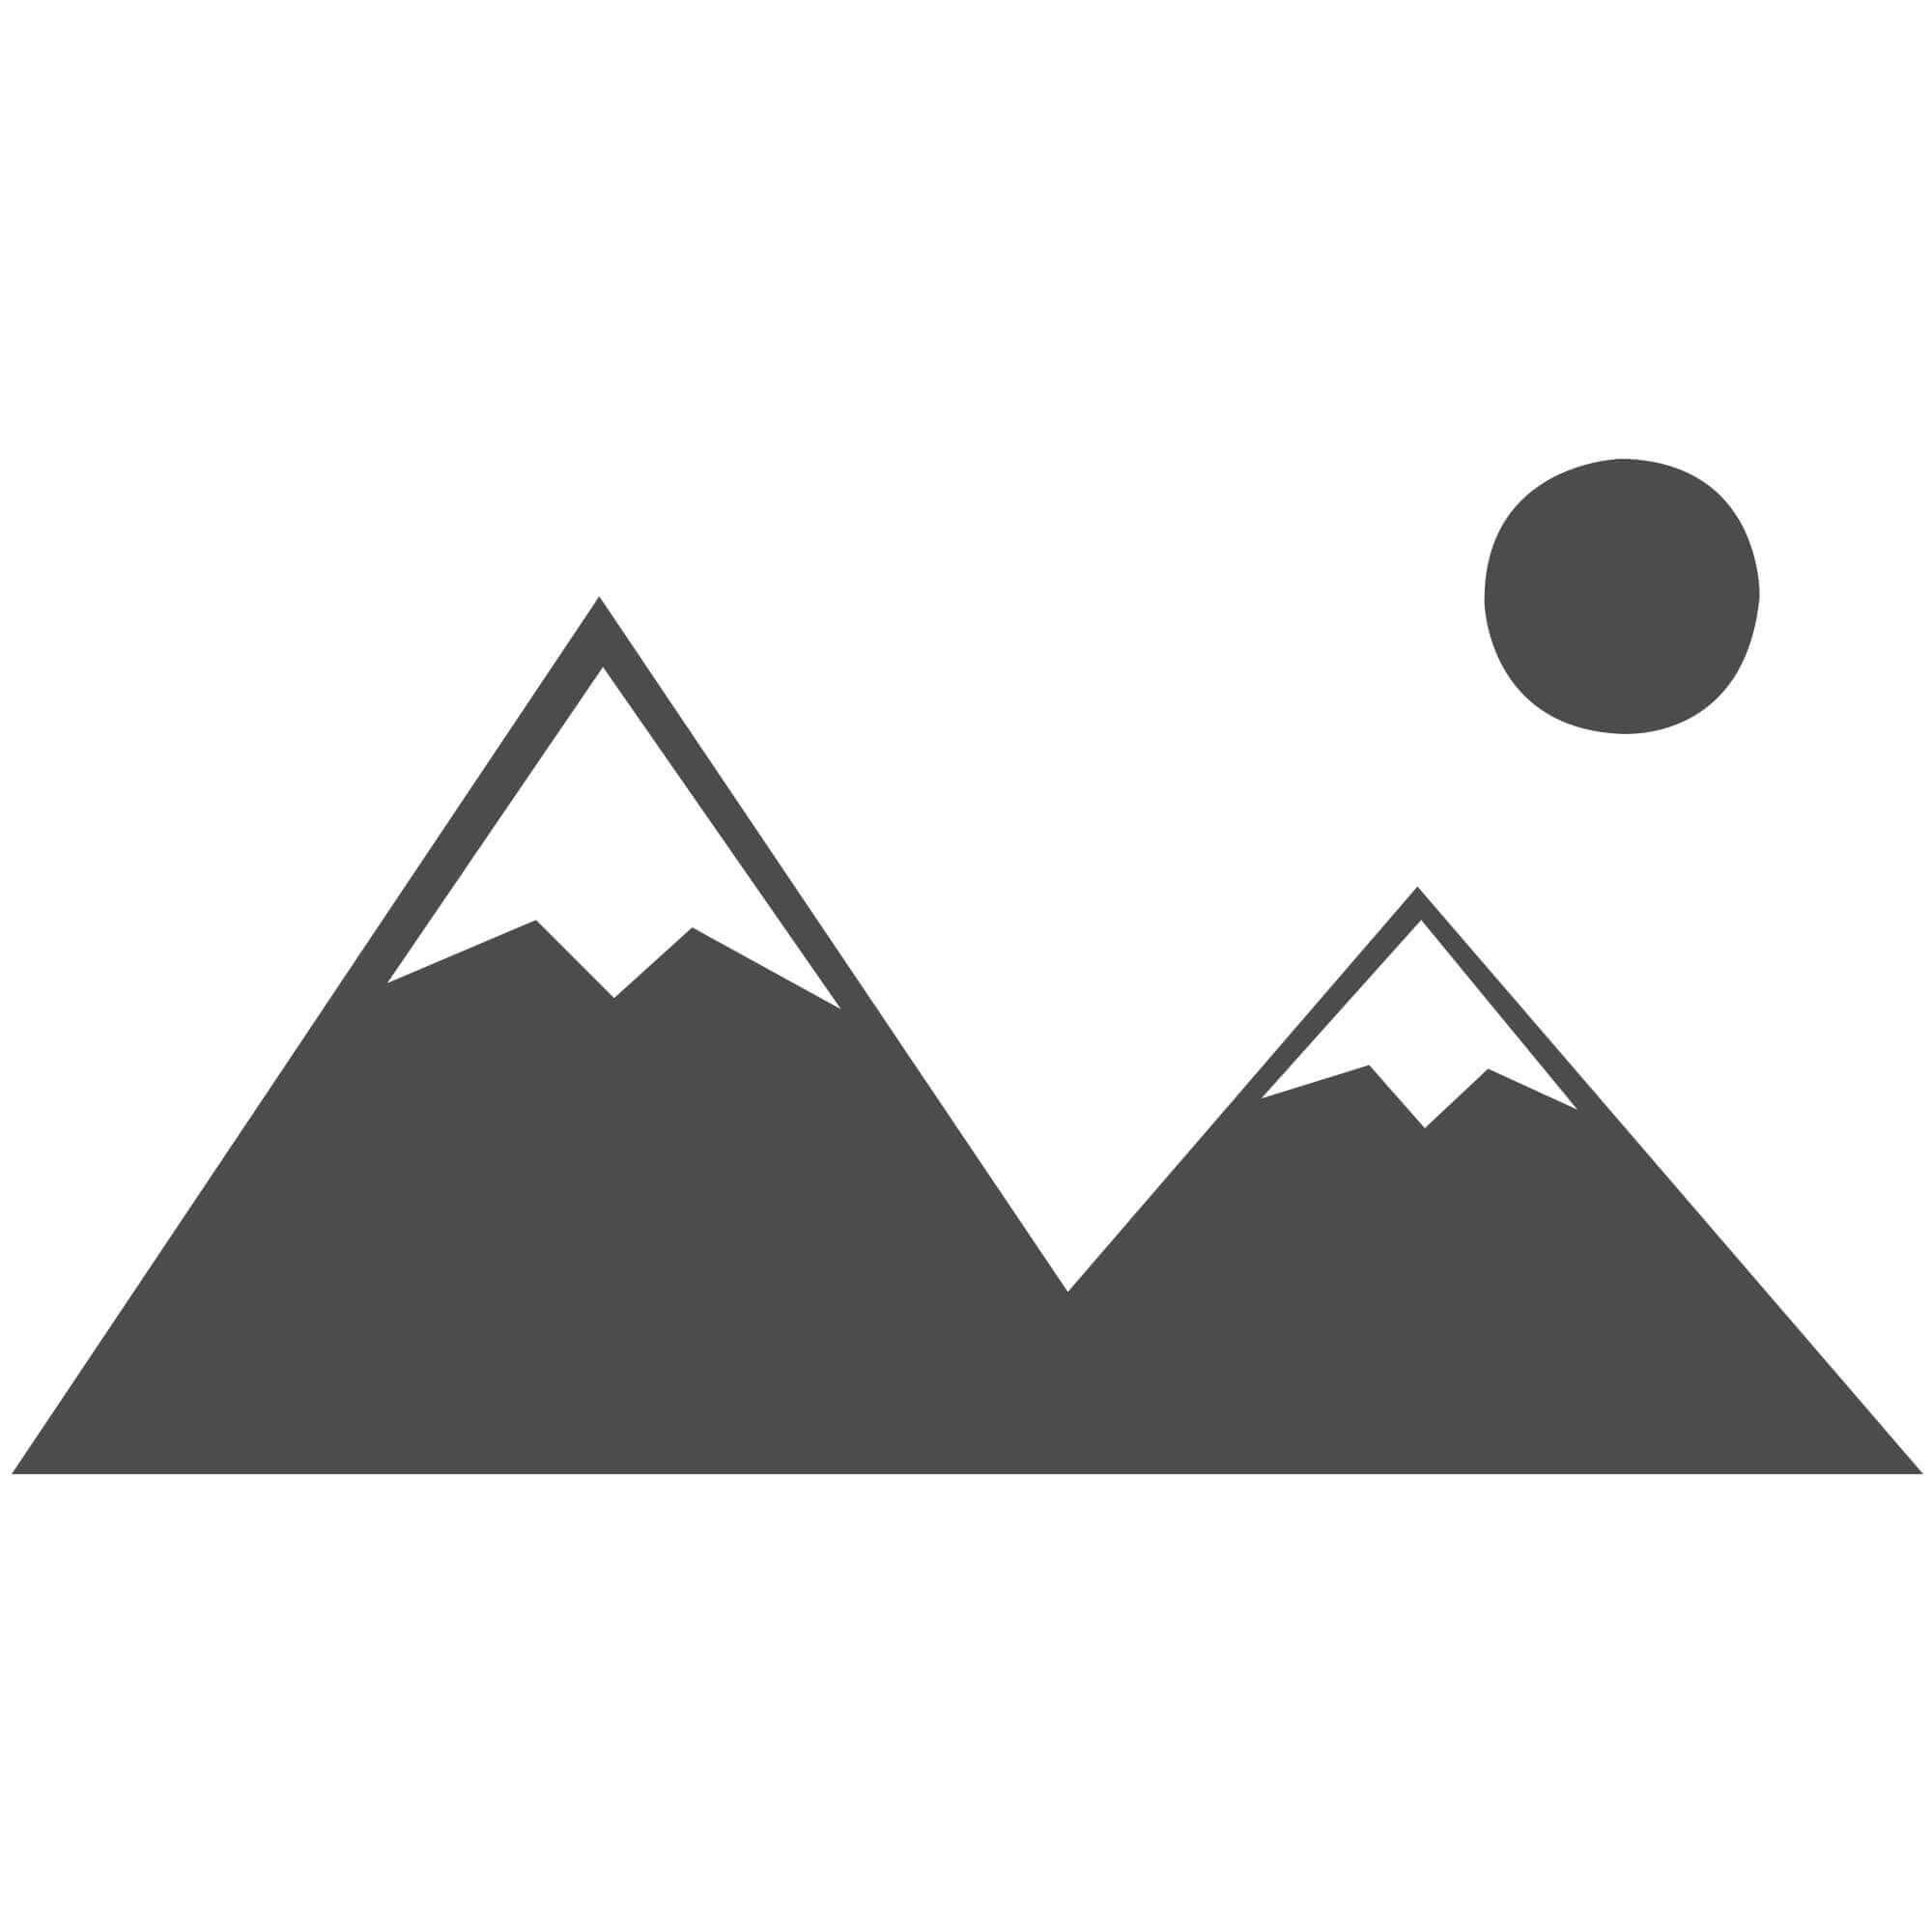 "Griot Stripe Rug - Adungu - Poppy Seed-76 x 122 cm (2'6"" x 4')"